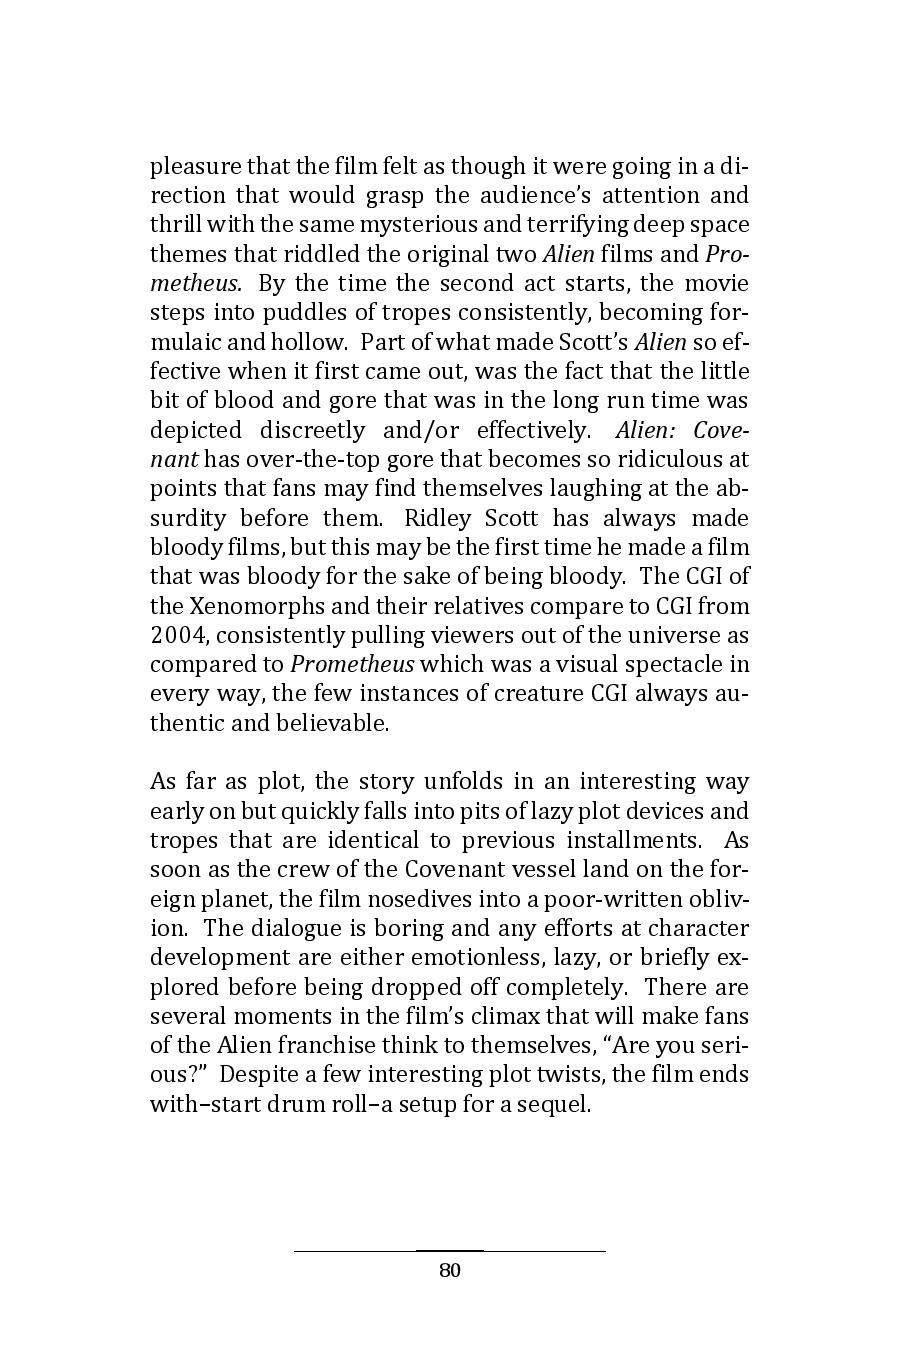 Hinnom Magazine 001 Manuscript 10-page-084